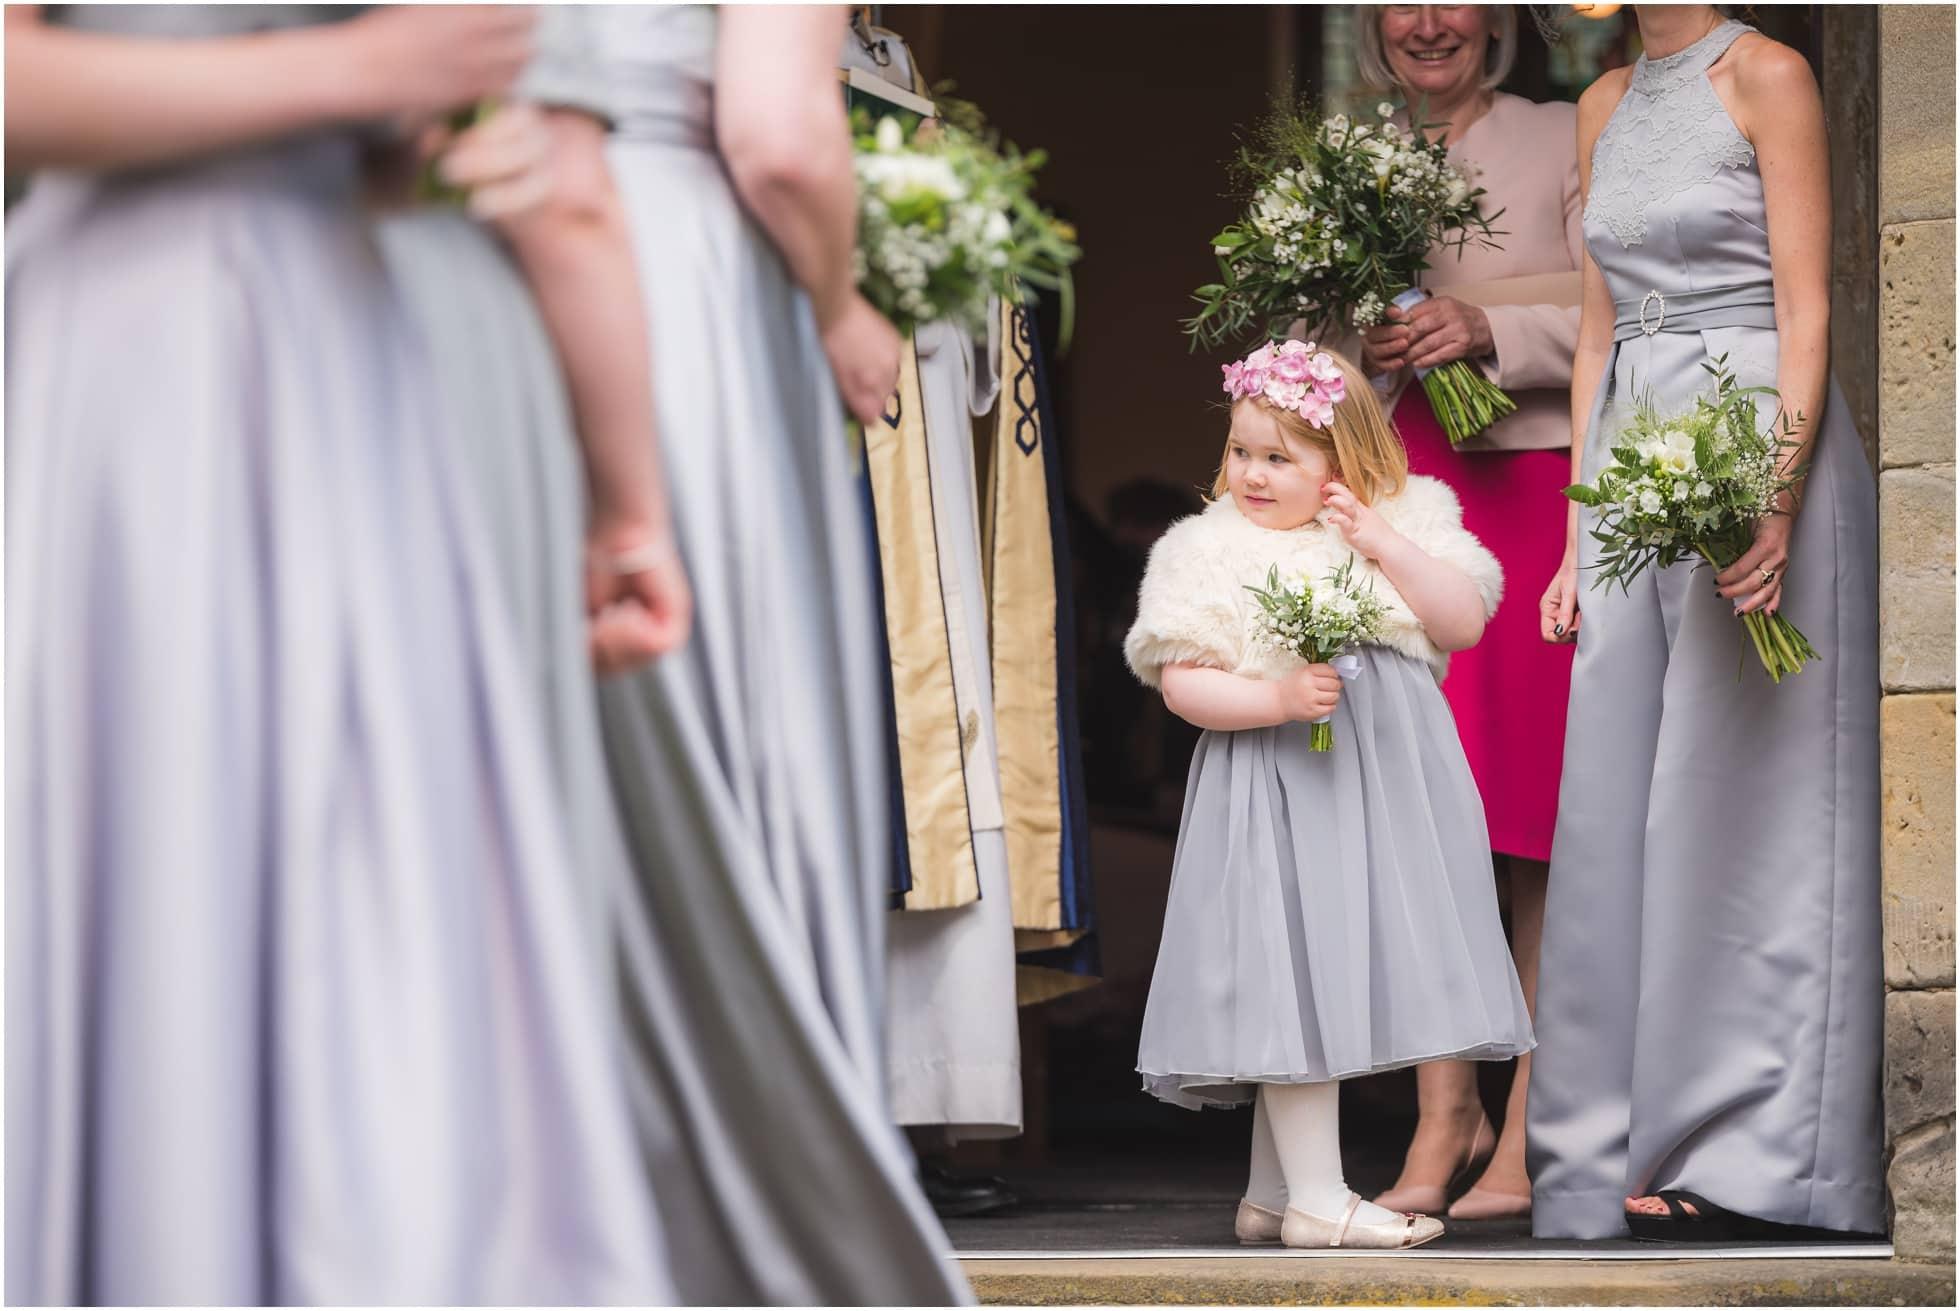 A little bridesmaid waiting to go inside the church